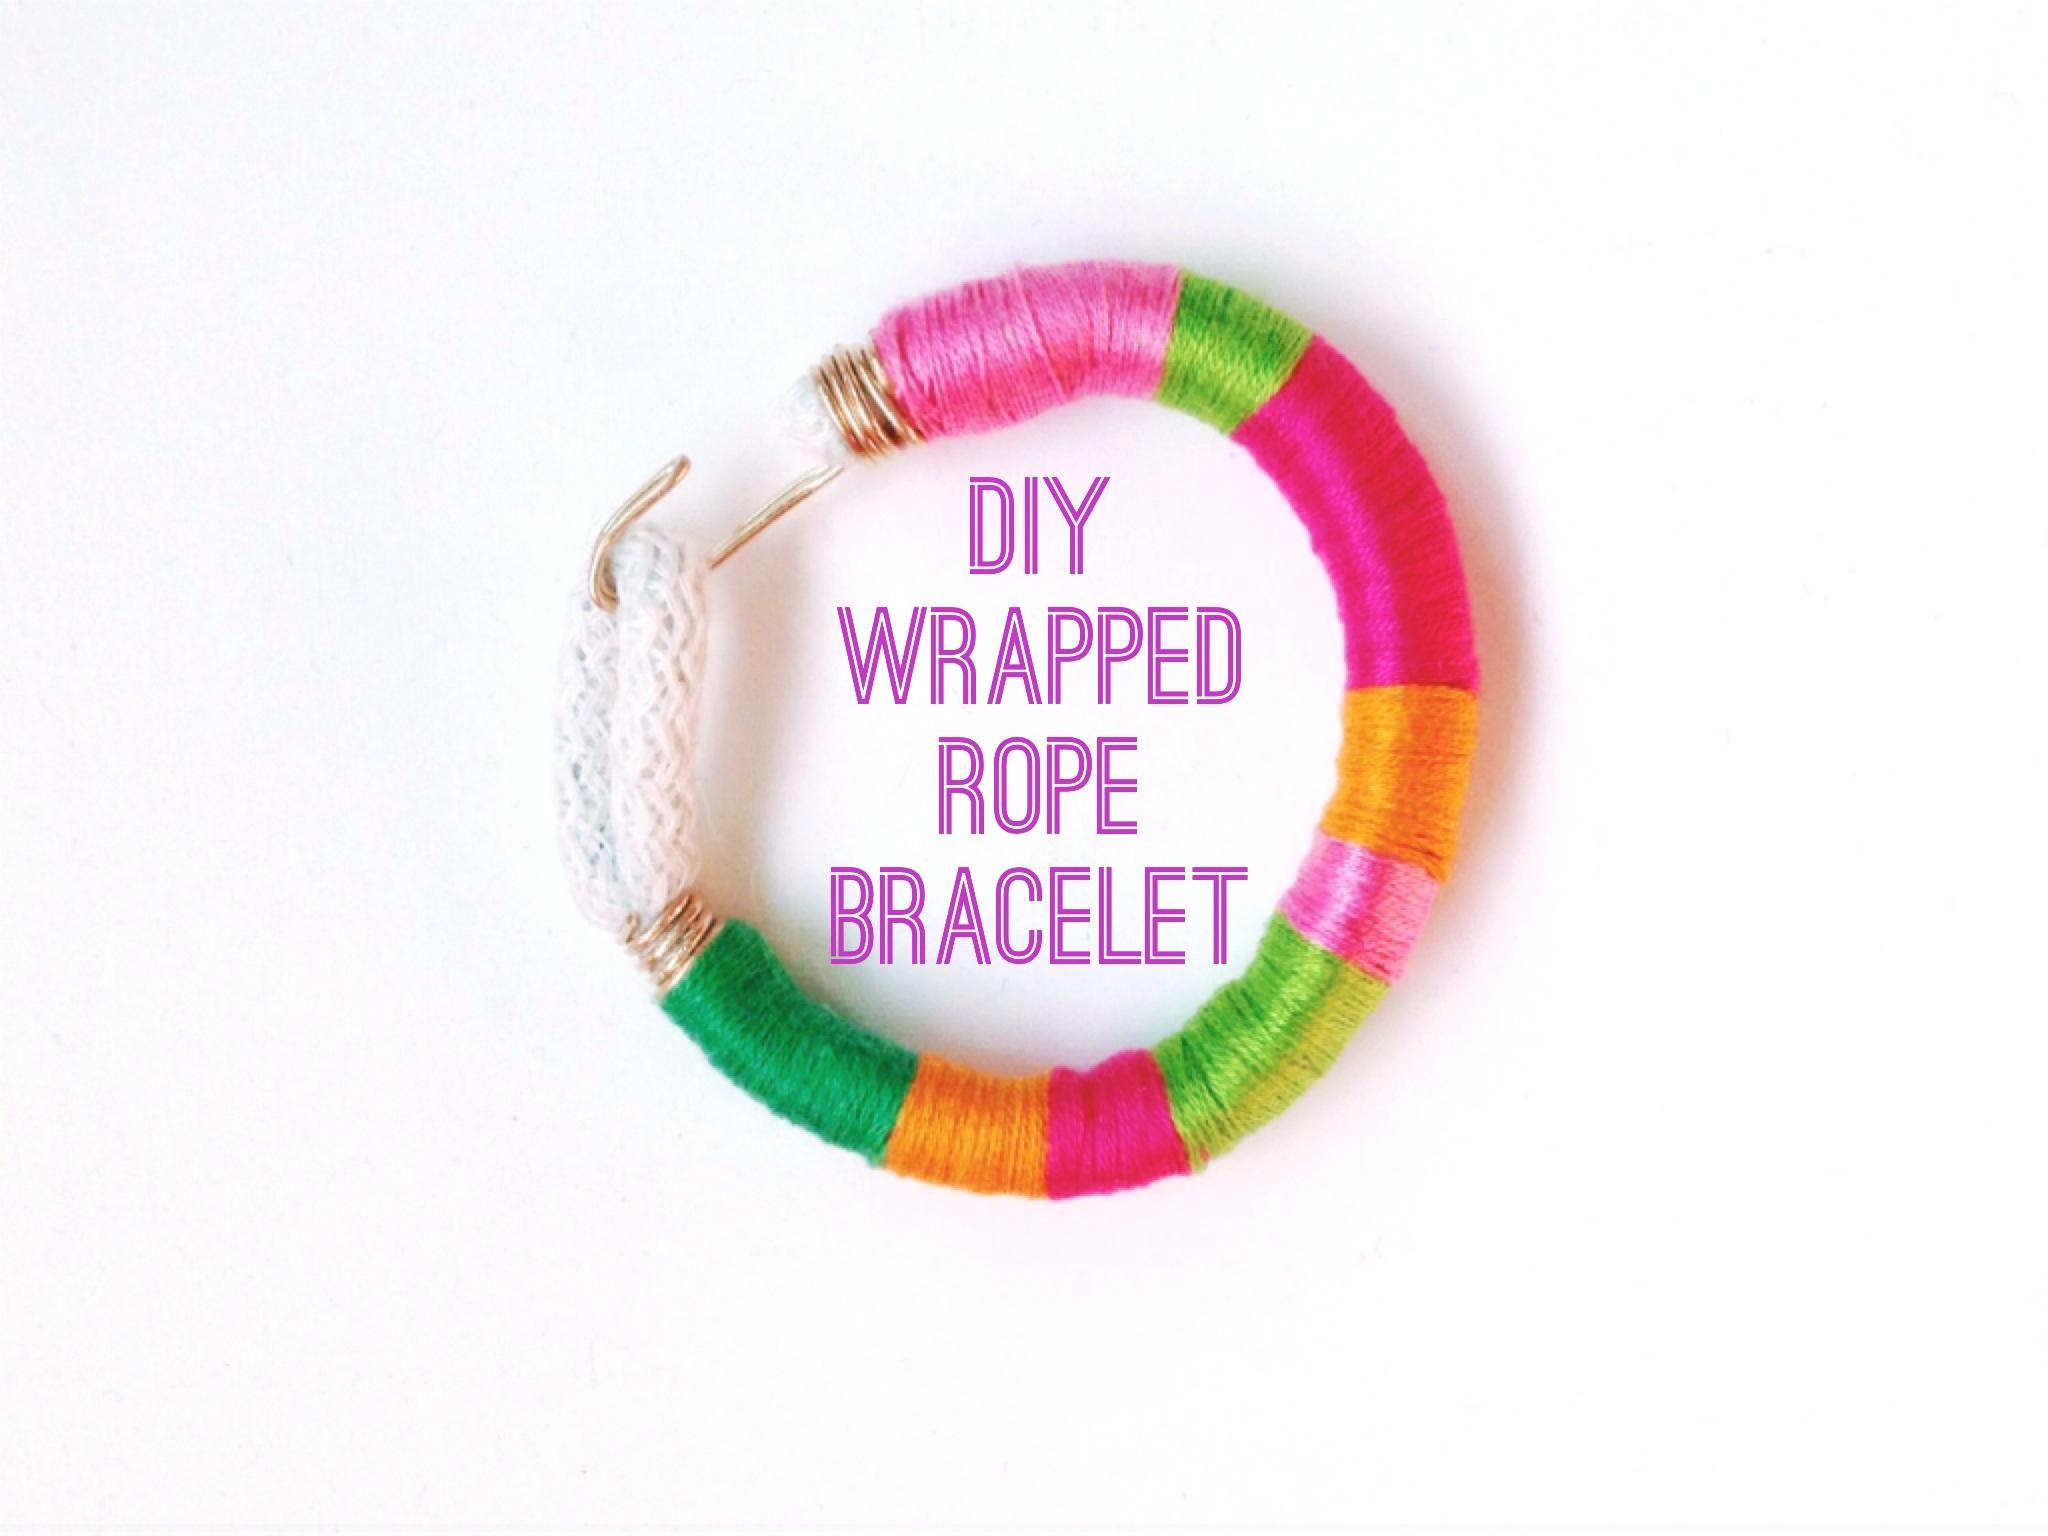 Wrapped rope bracelet DIY